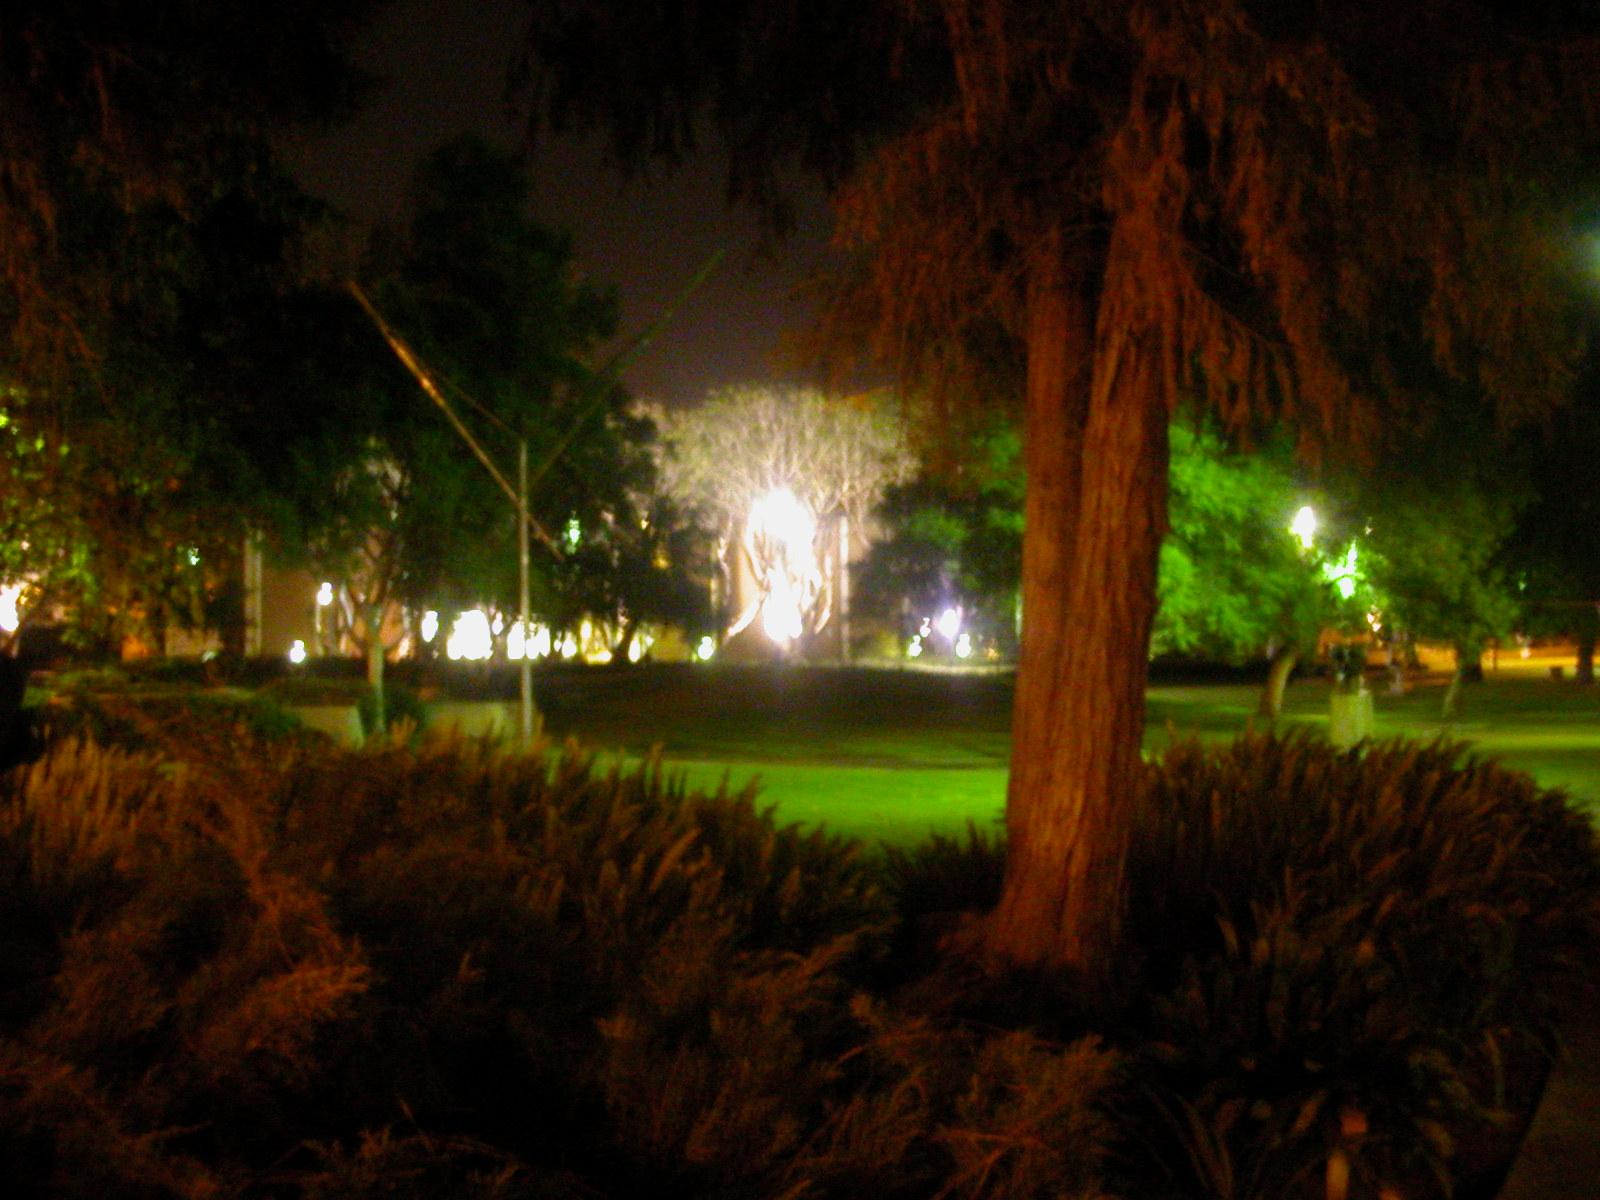 ucla campus at night - photo #45